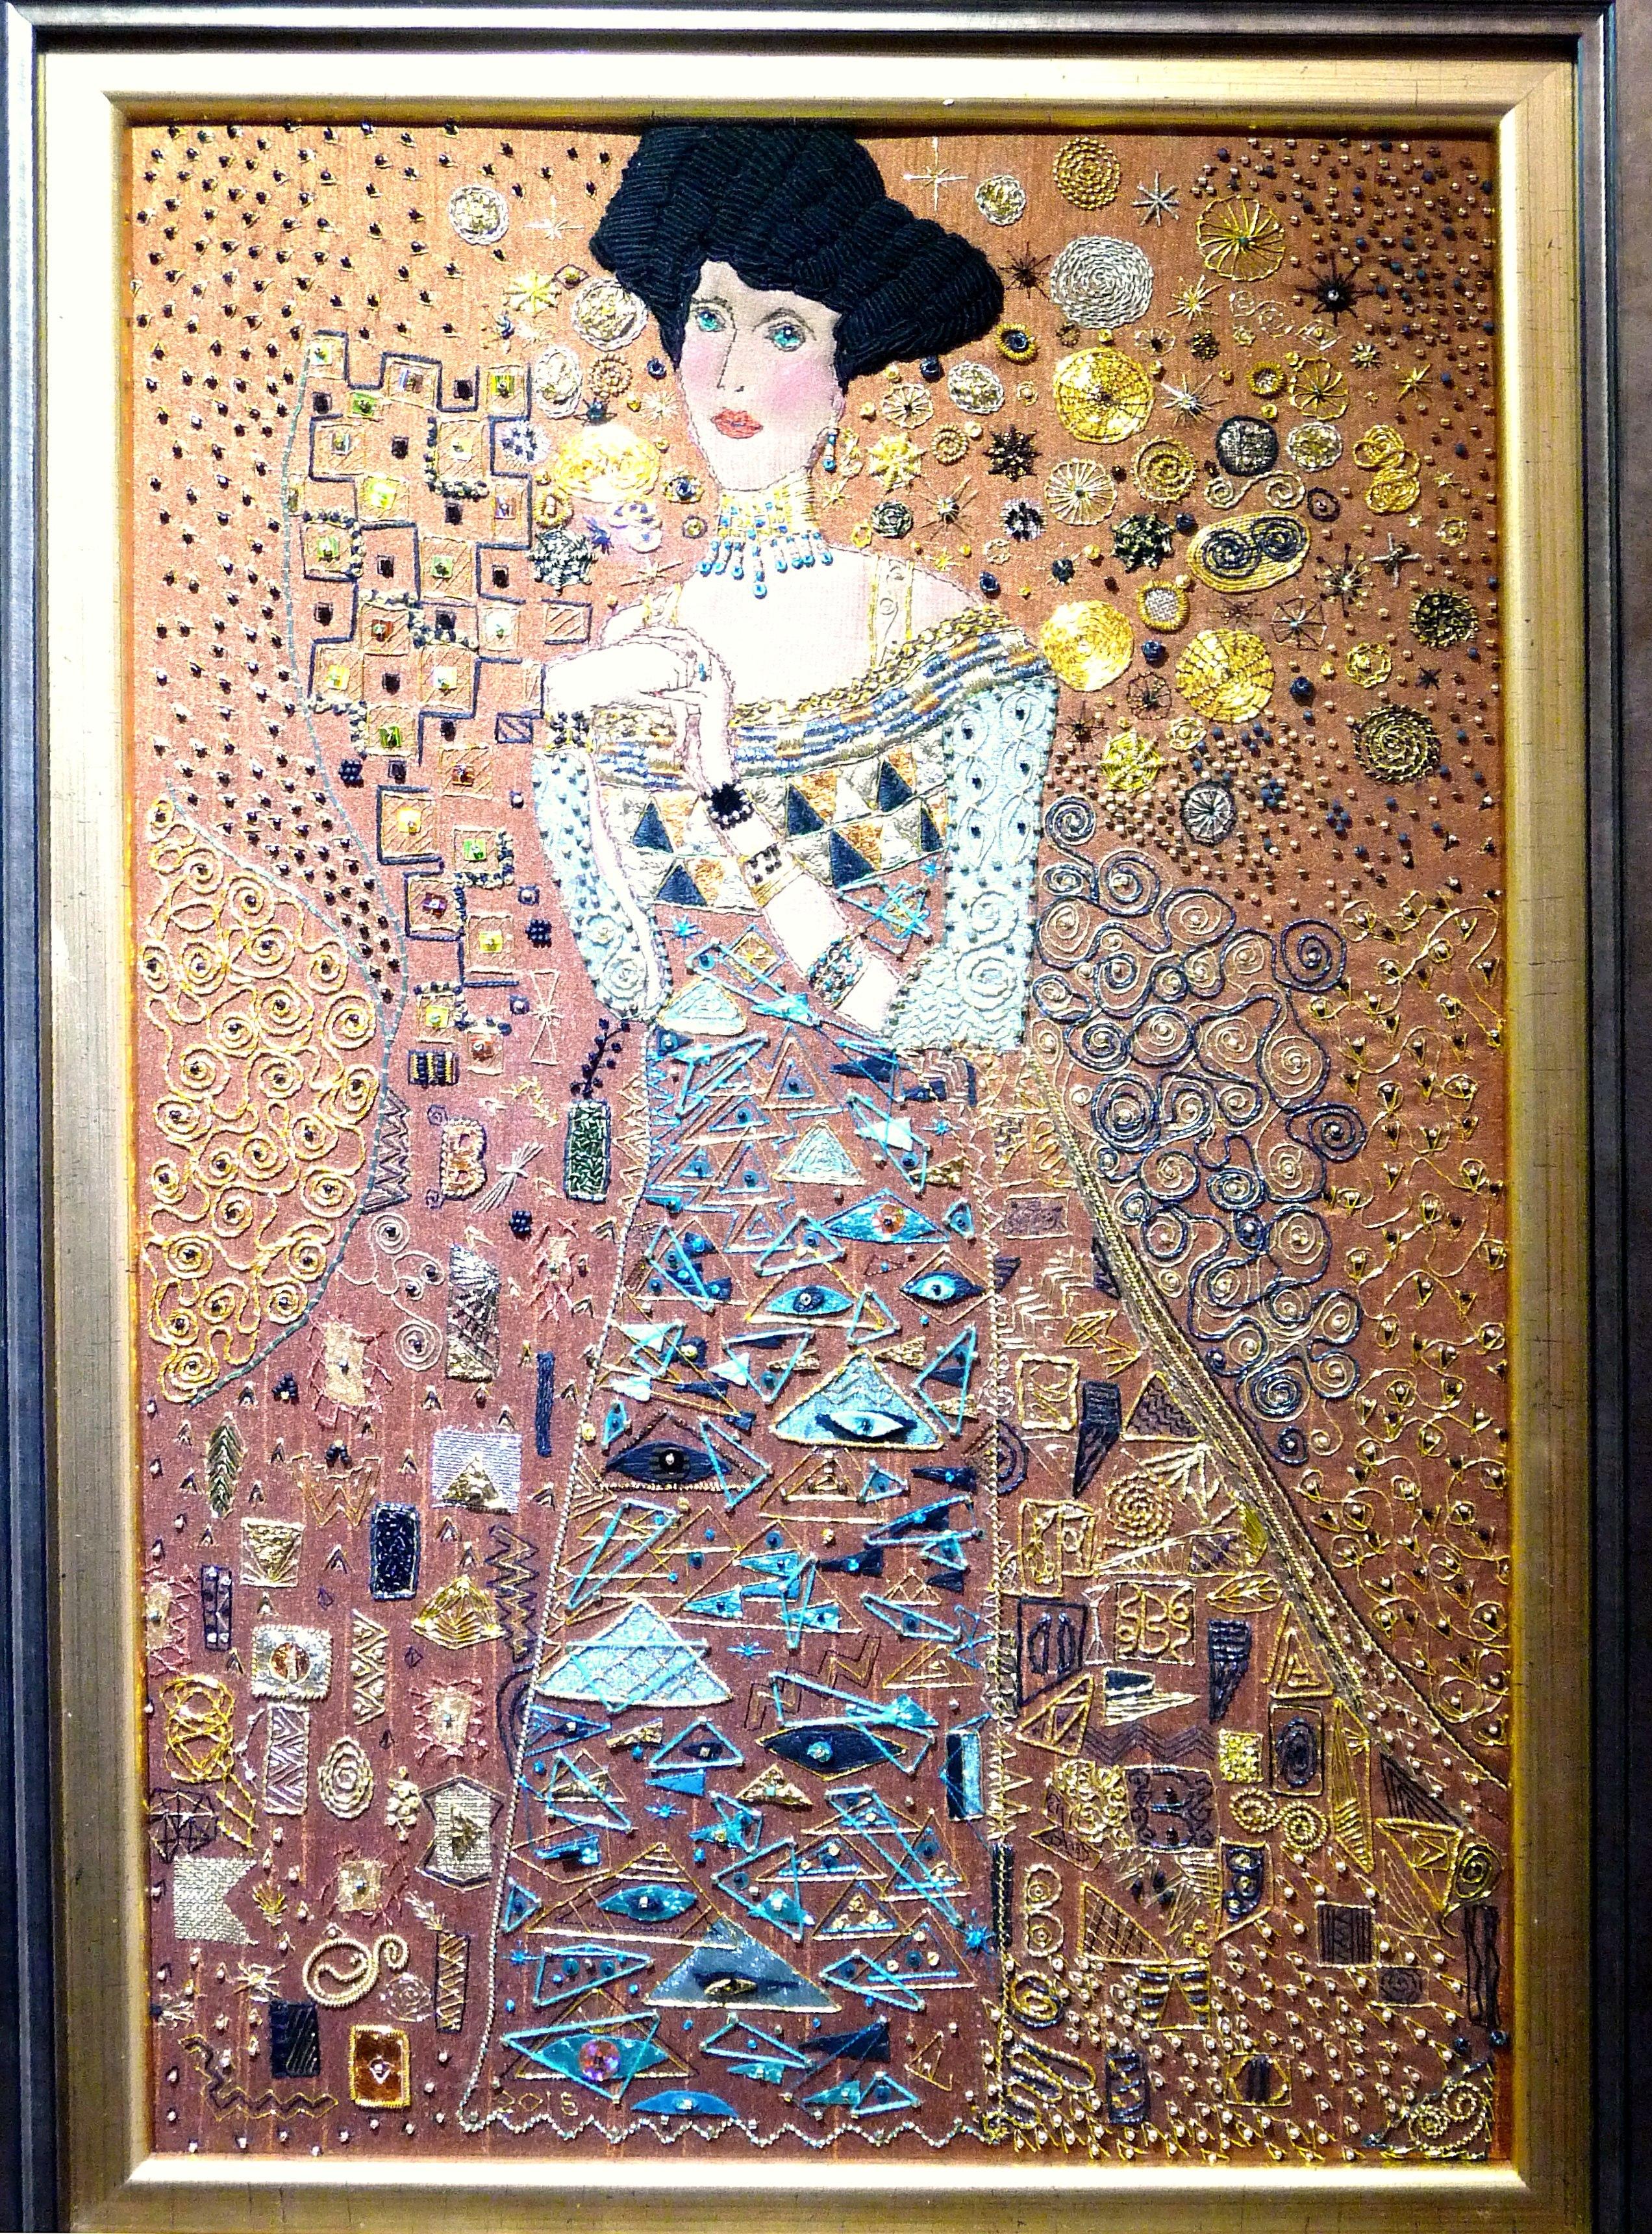 KLIMPT'S ADELE by Wendy Cartwright, goldwork. Winner of Joyce Stubbs Memorial Prize for Traditional Embroidery at N.Wales Bienniel 2015